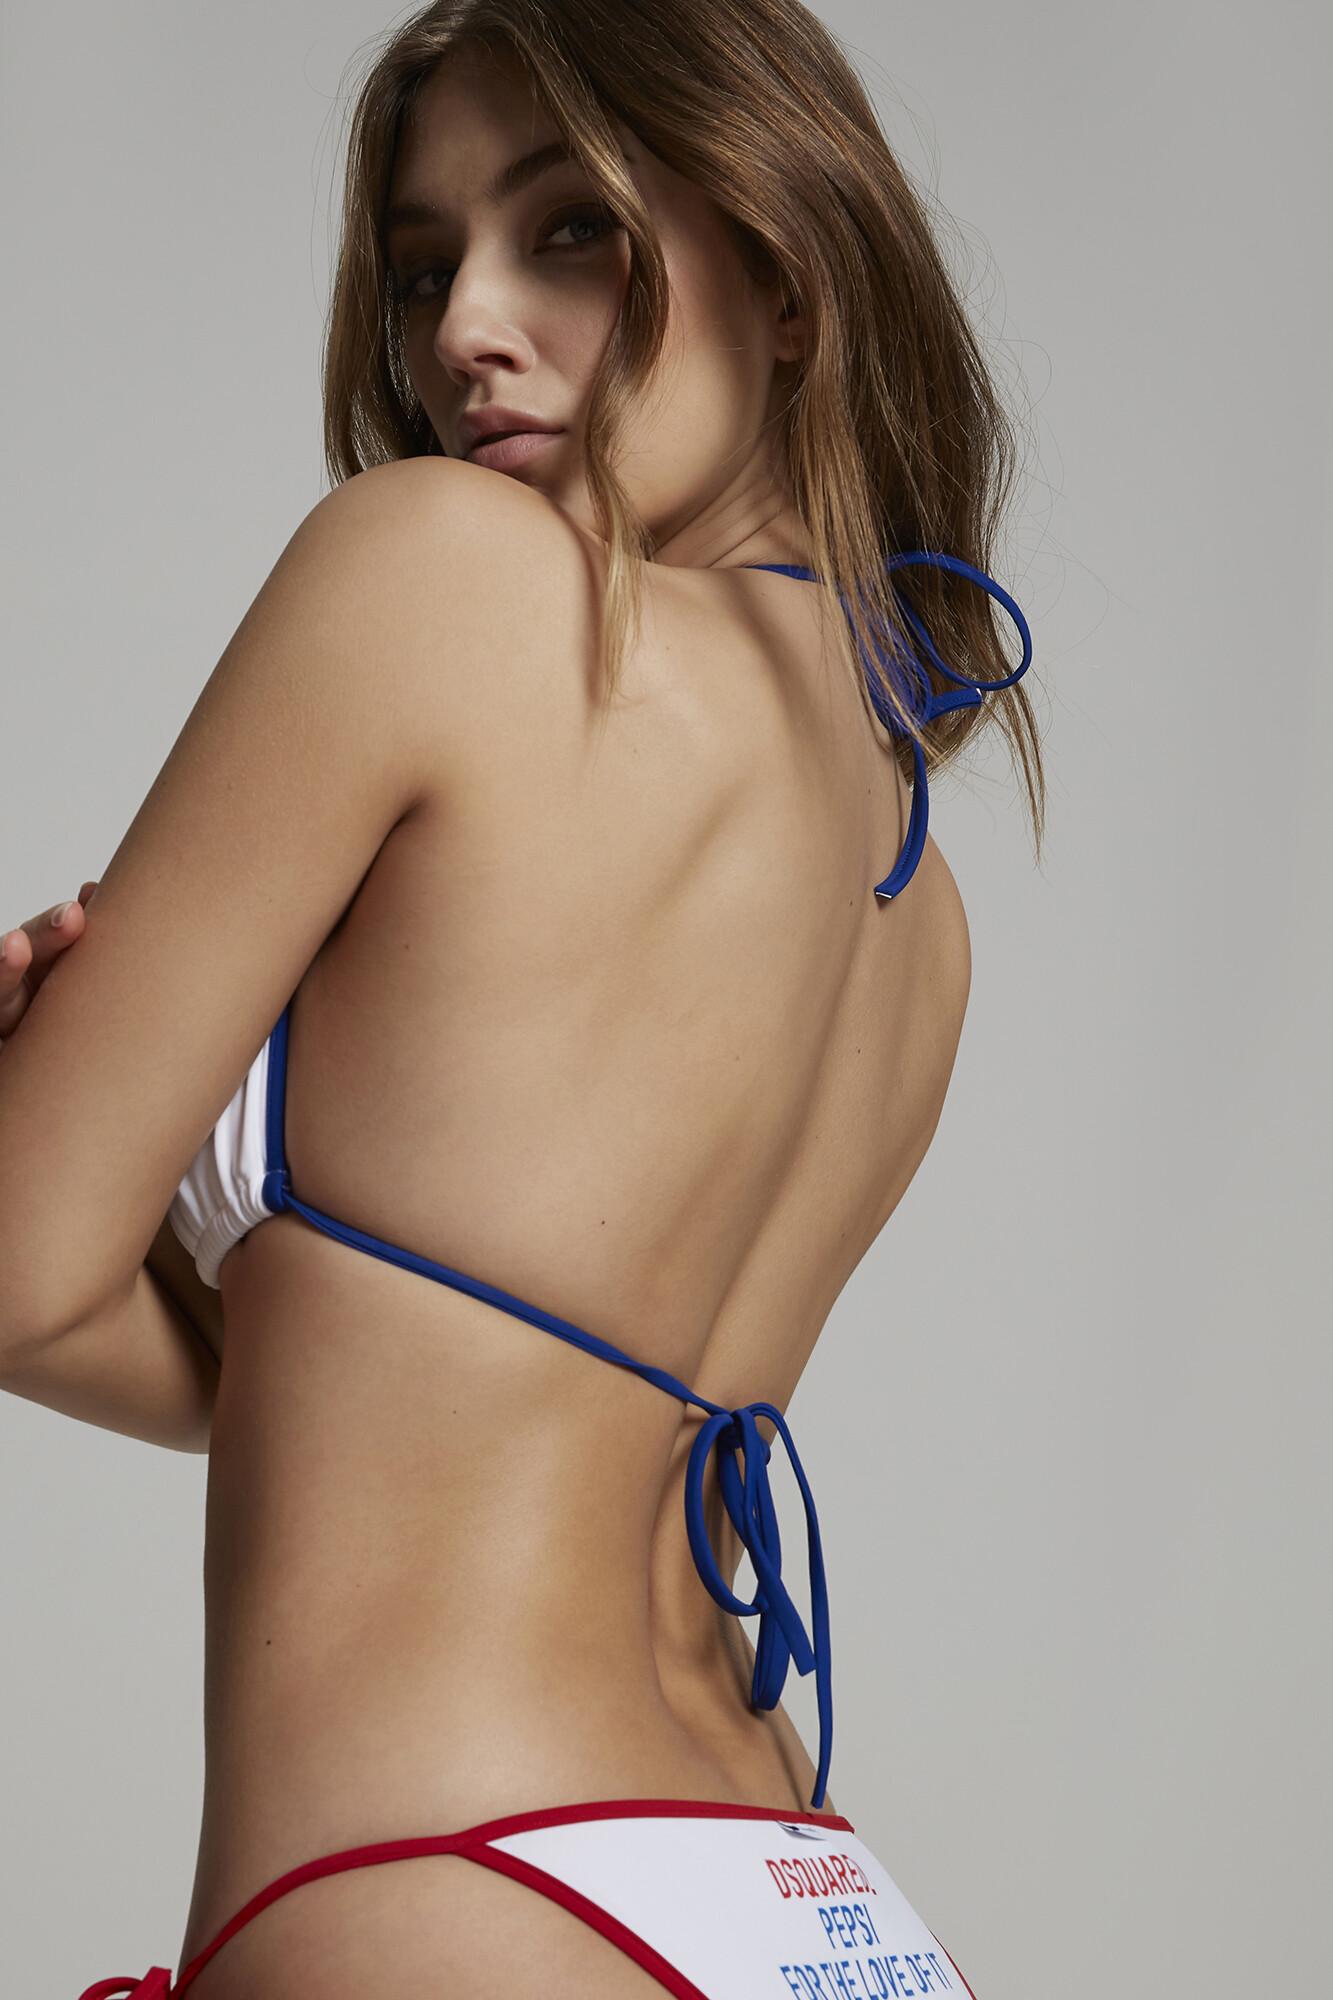 lorena-rae-bikini